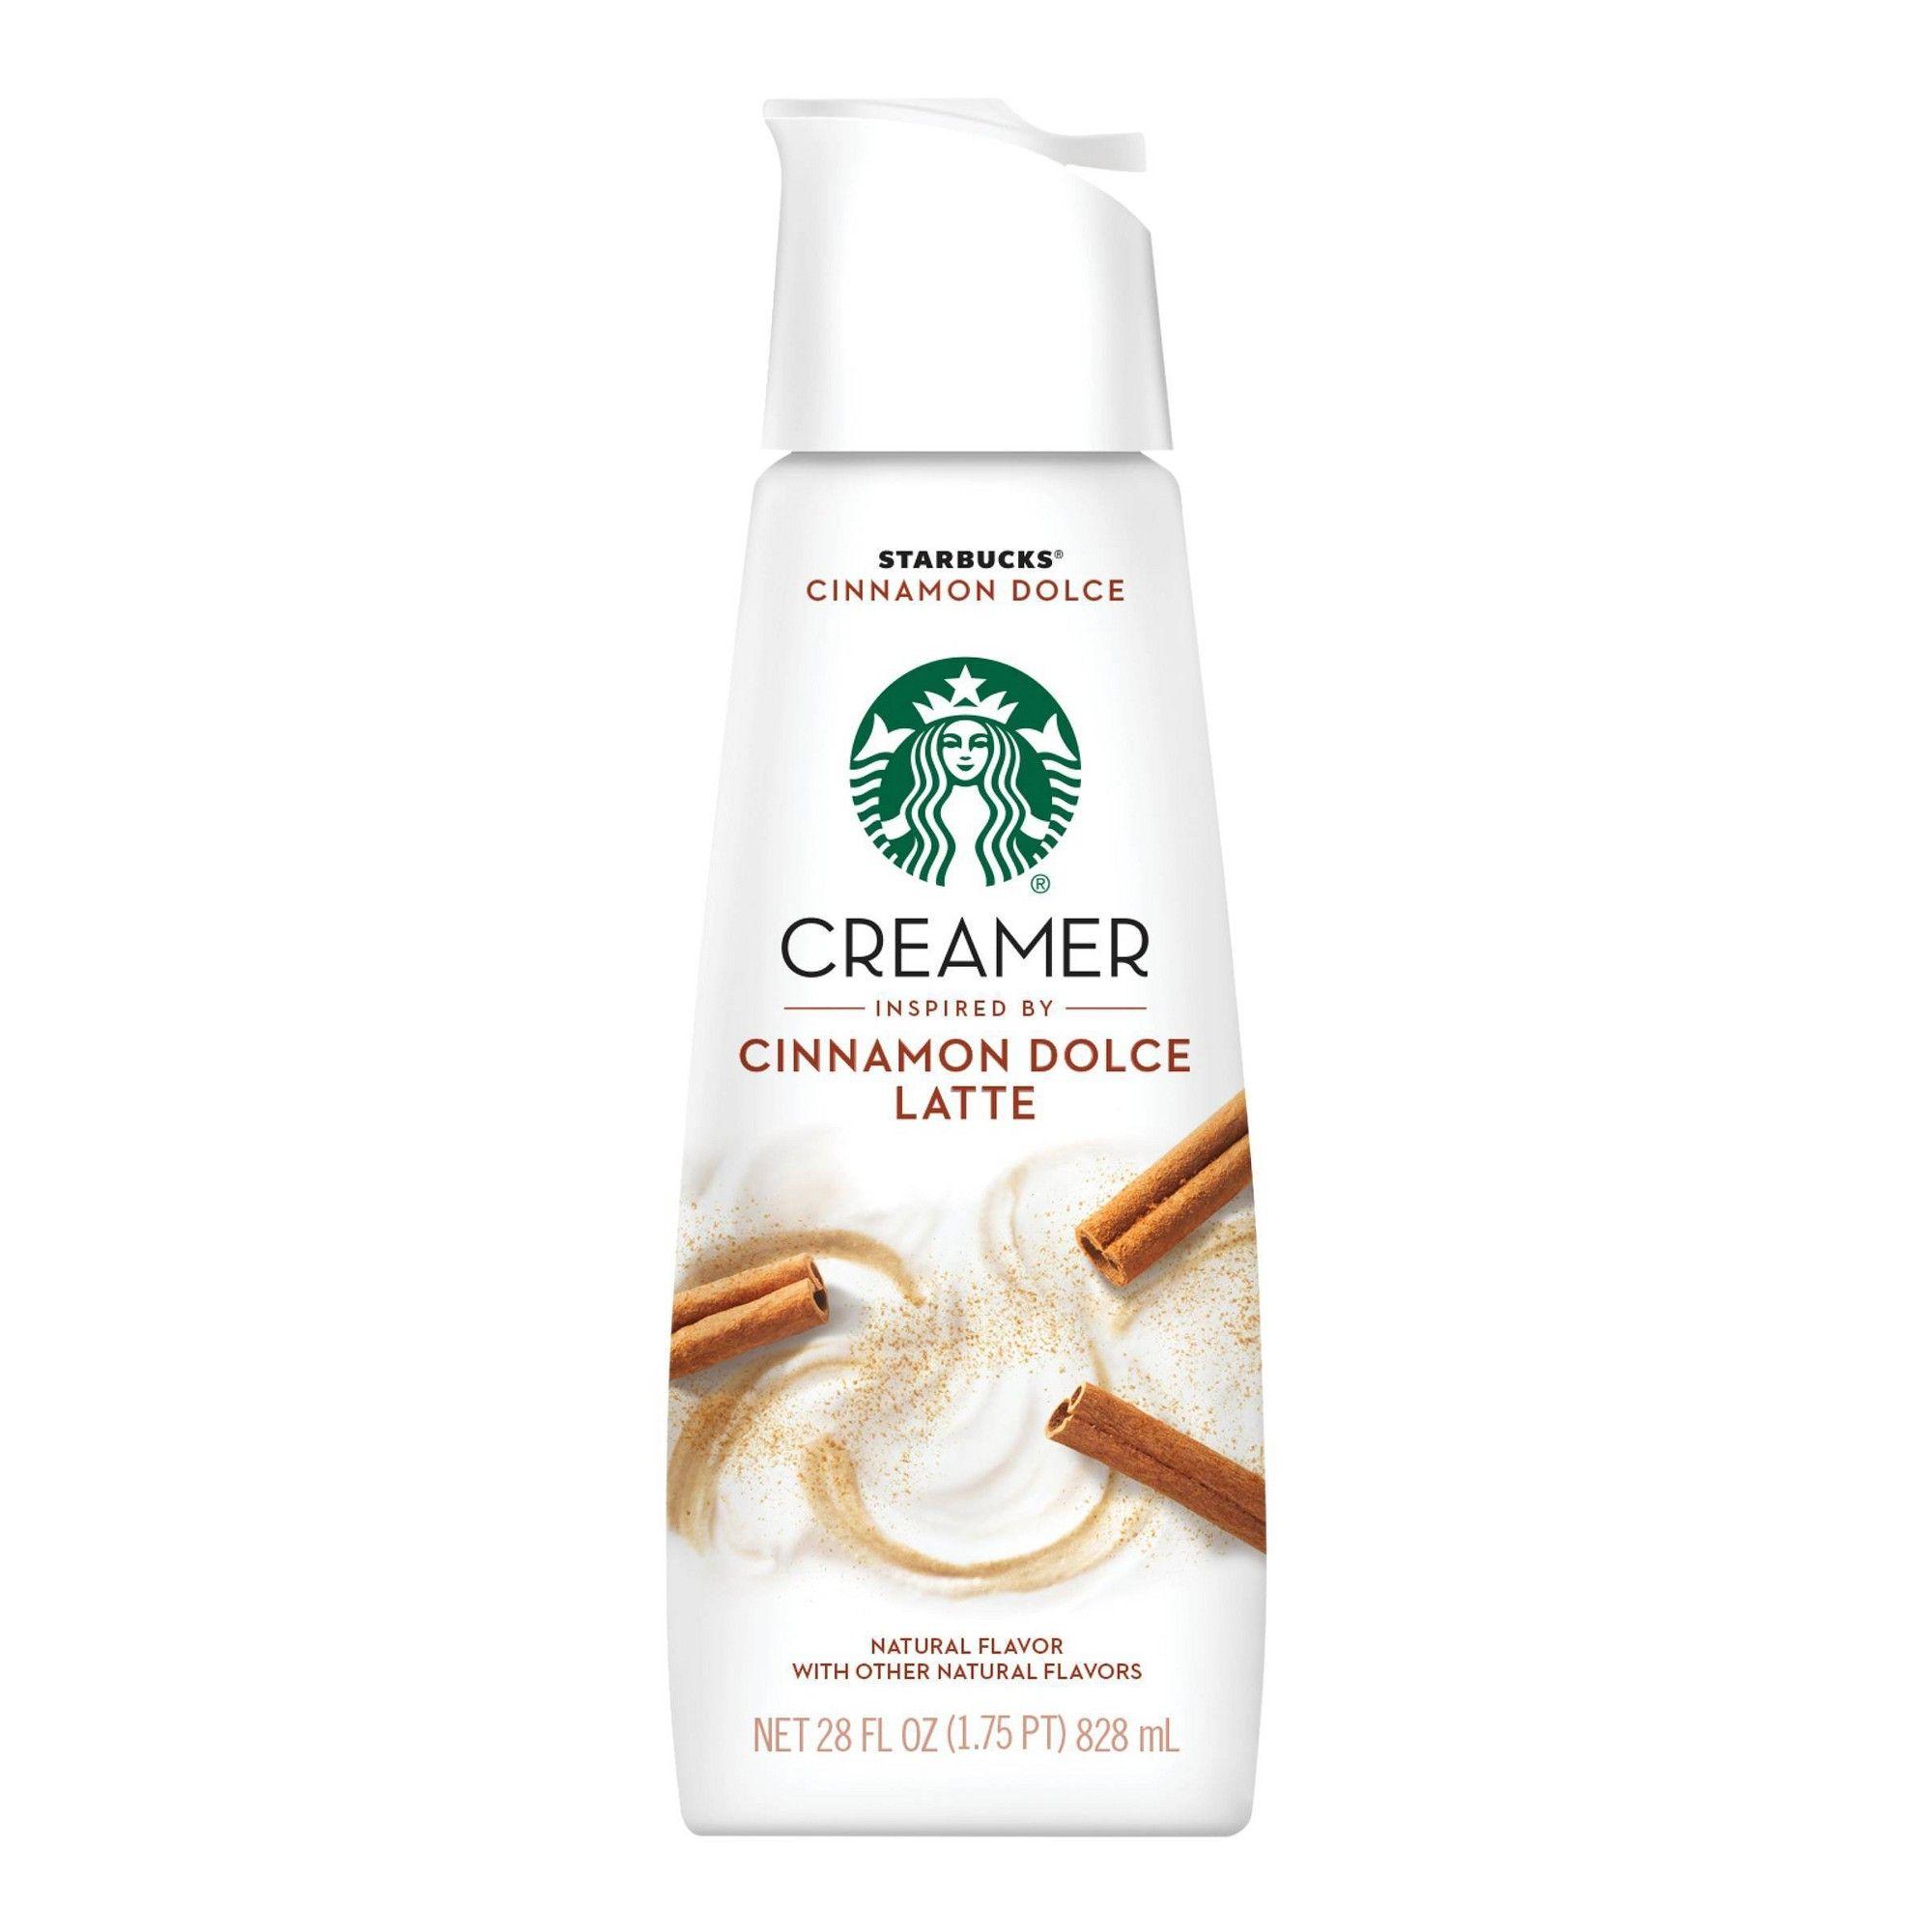 Starbucks Cinnamon Dolce Creamer - 28 Fl Oz